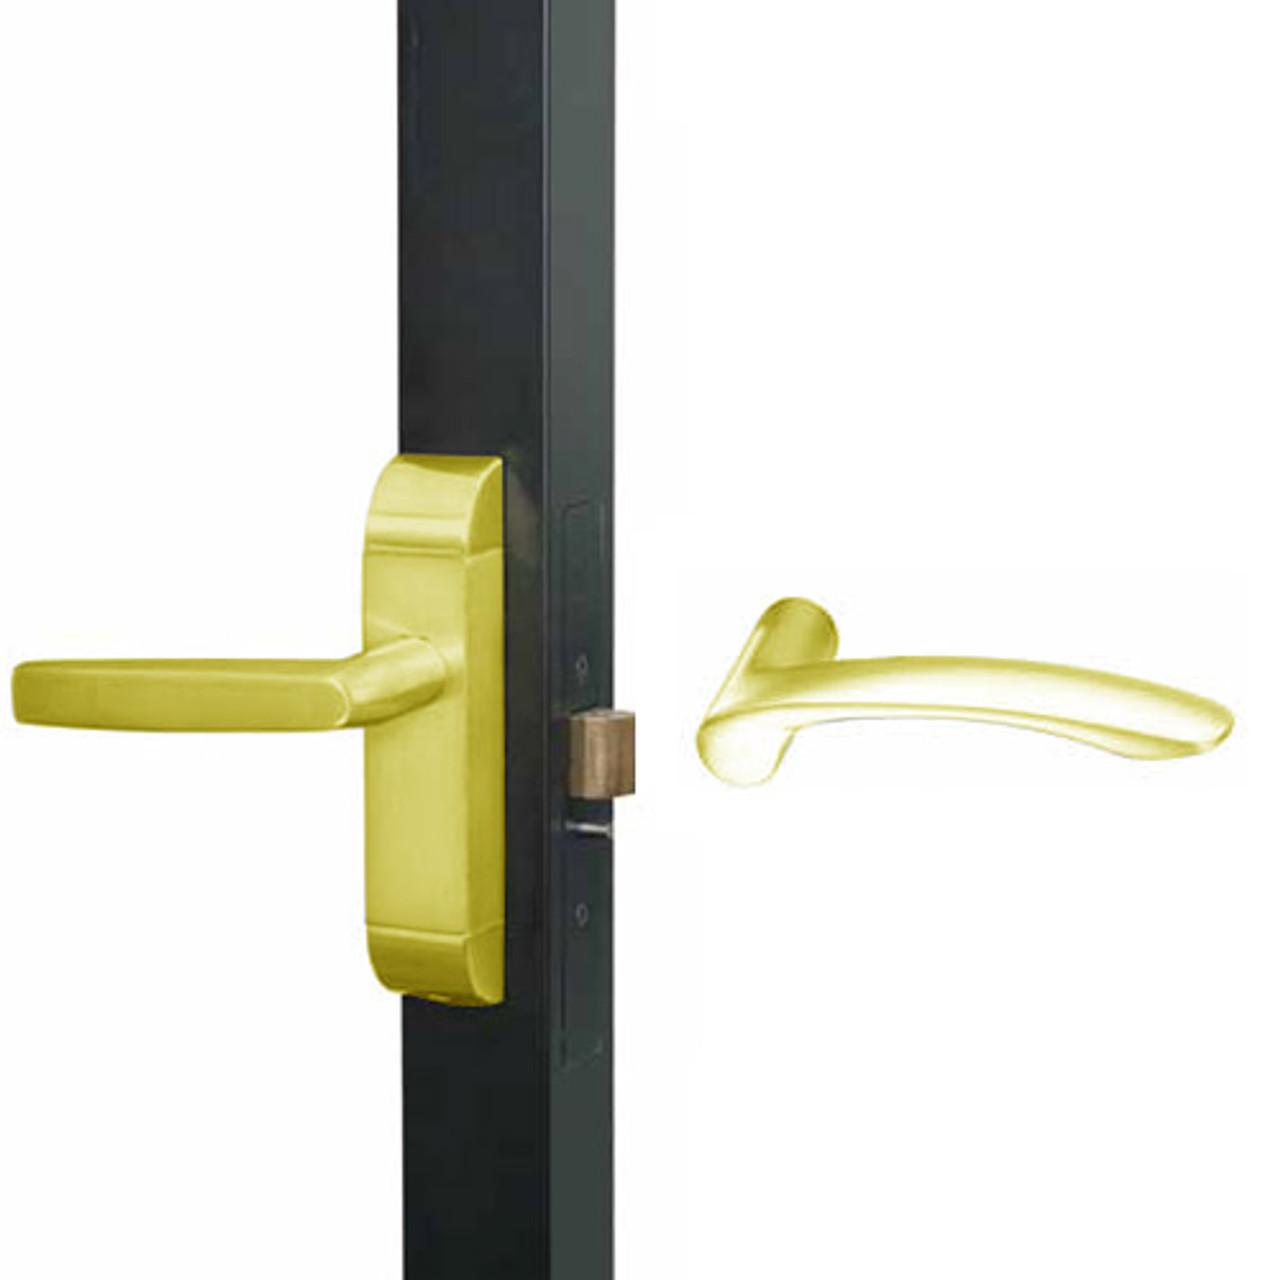 4600-MV-641-US3 Adams Rite MV Designer Deadlatch handle in Bright Brass Finish